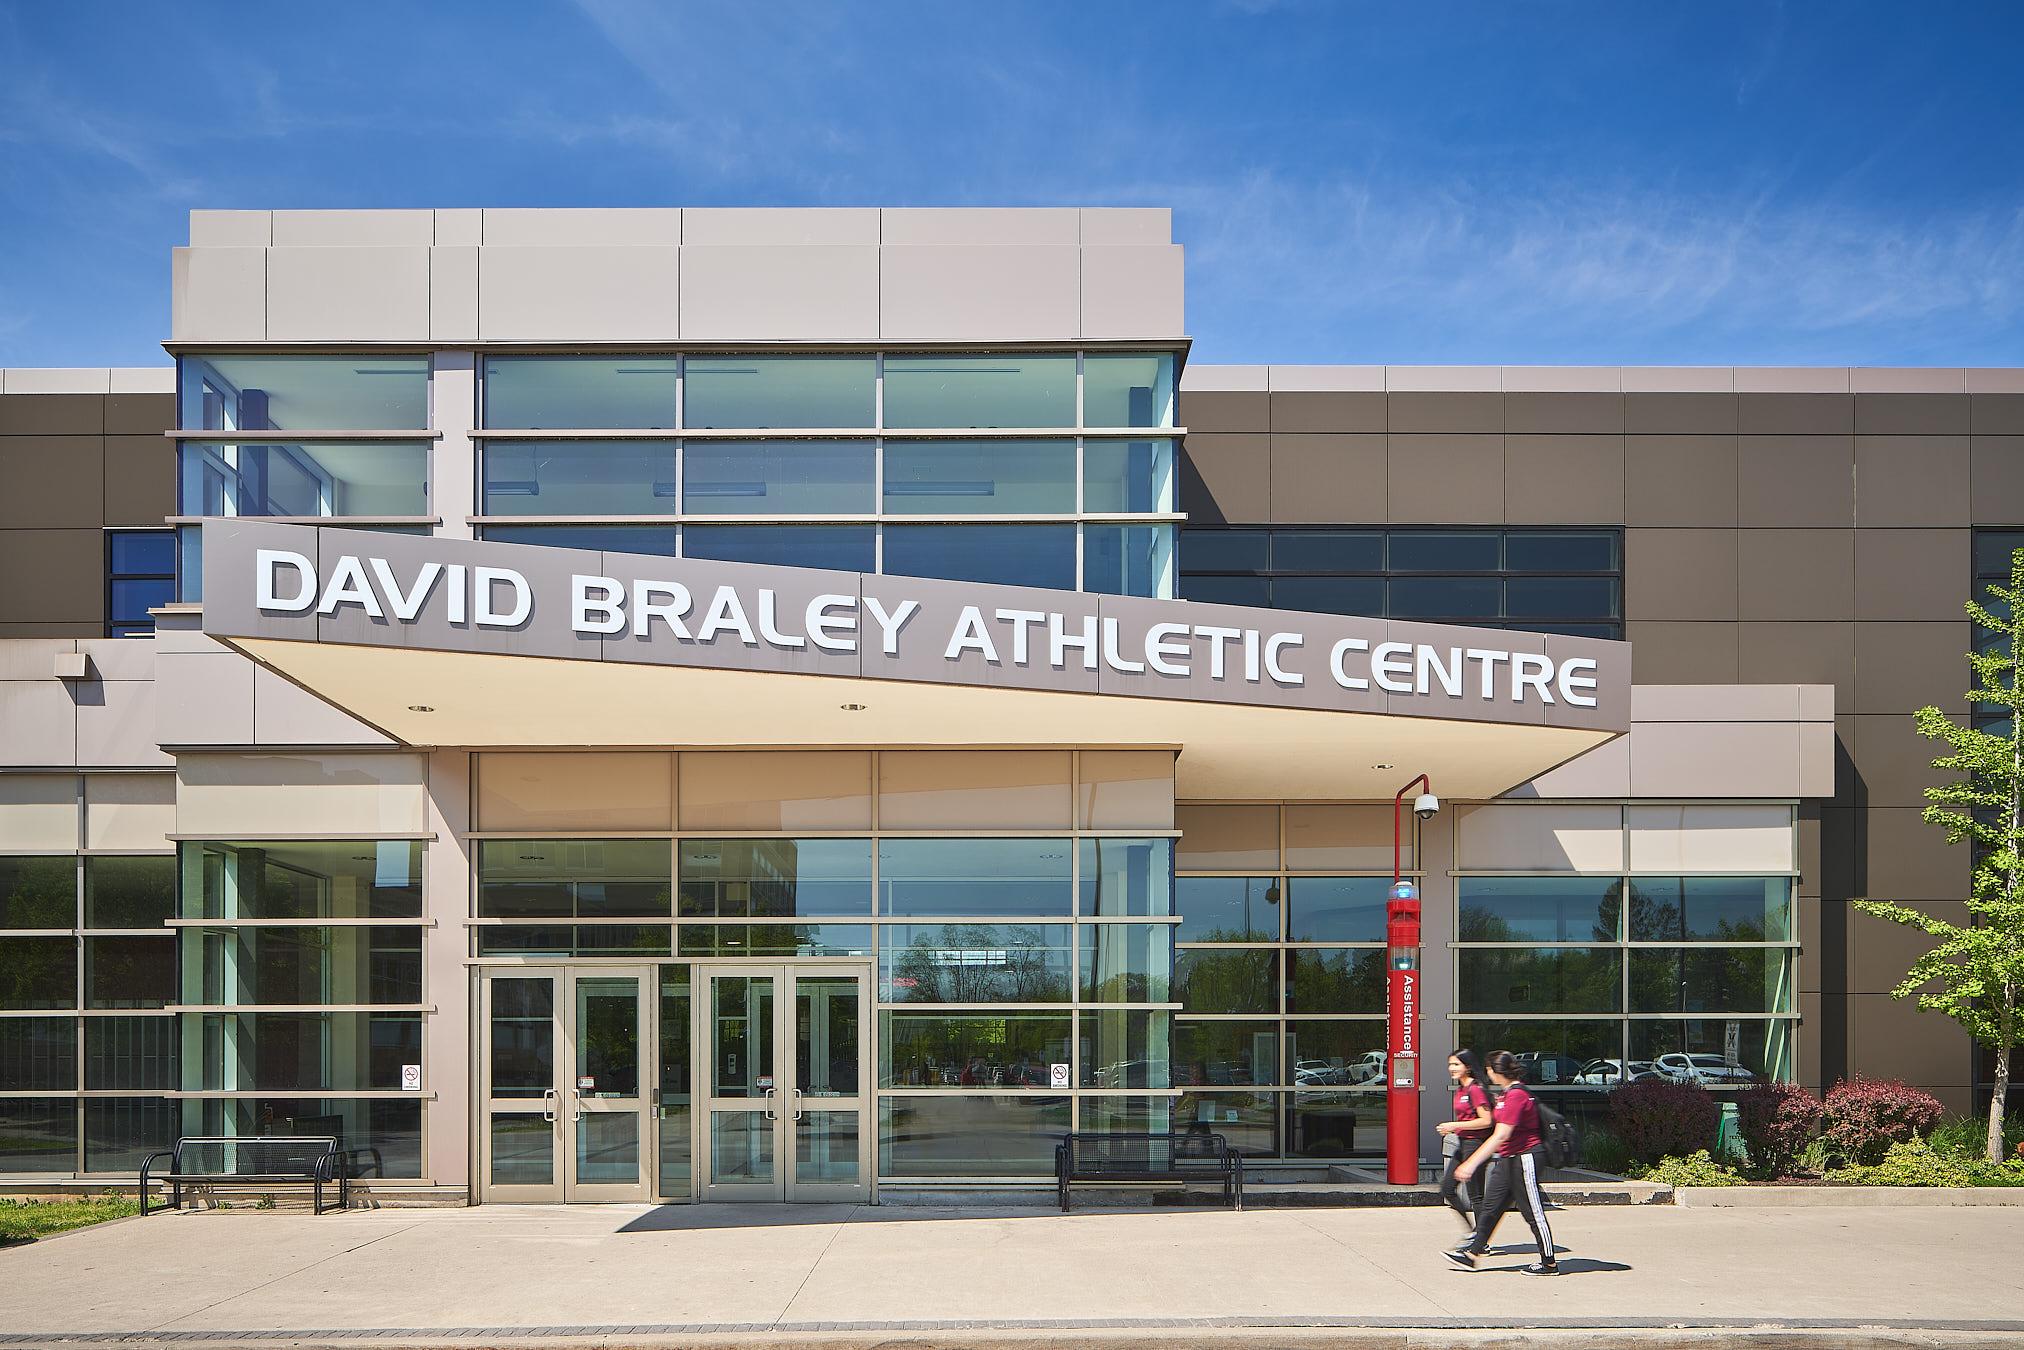 094-GEC David Braley Athletic Centre.jpg